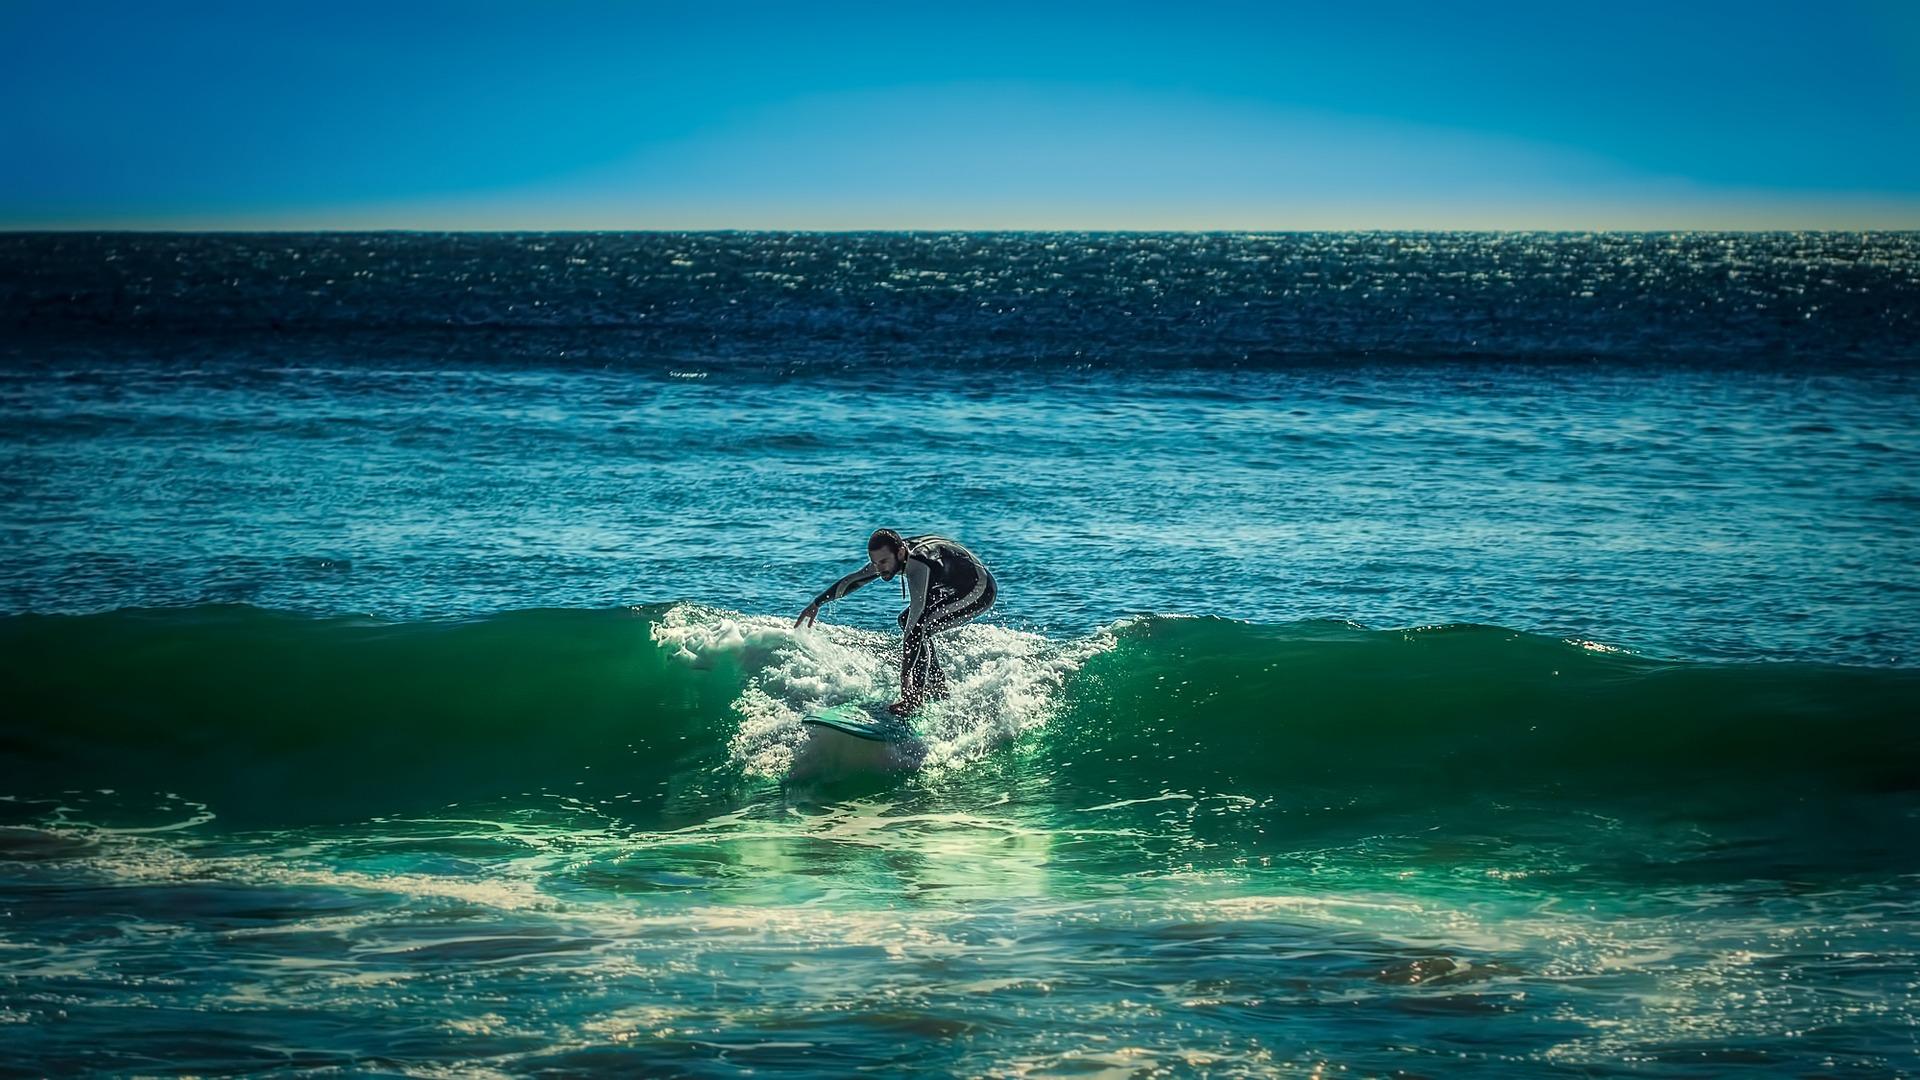 Nazarè surfista